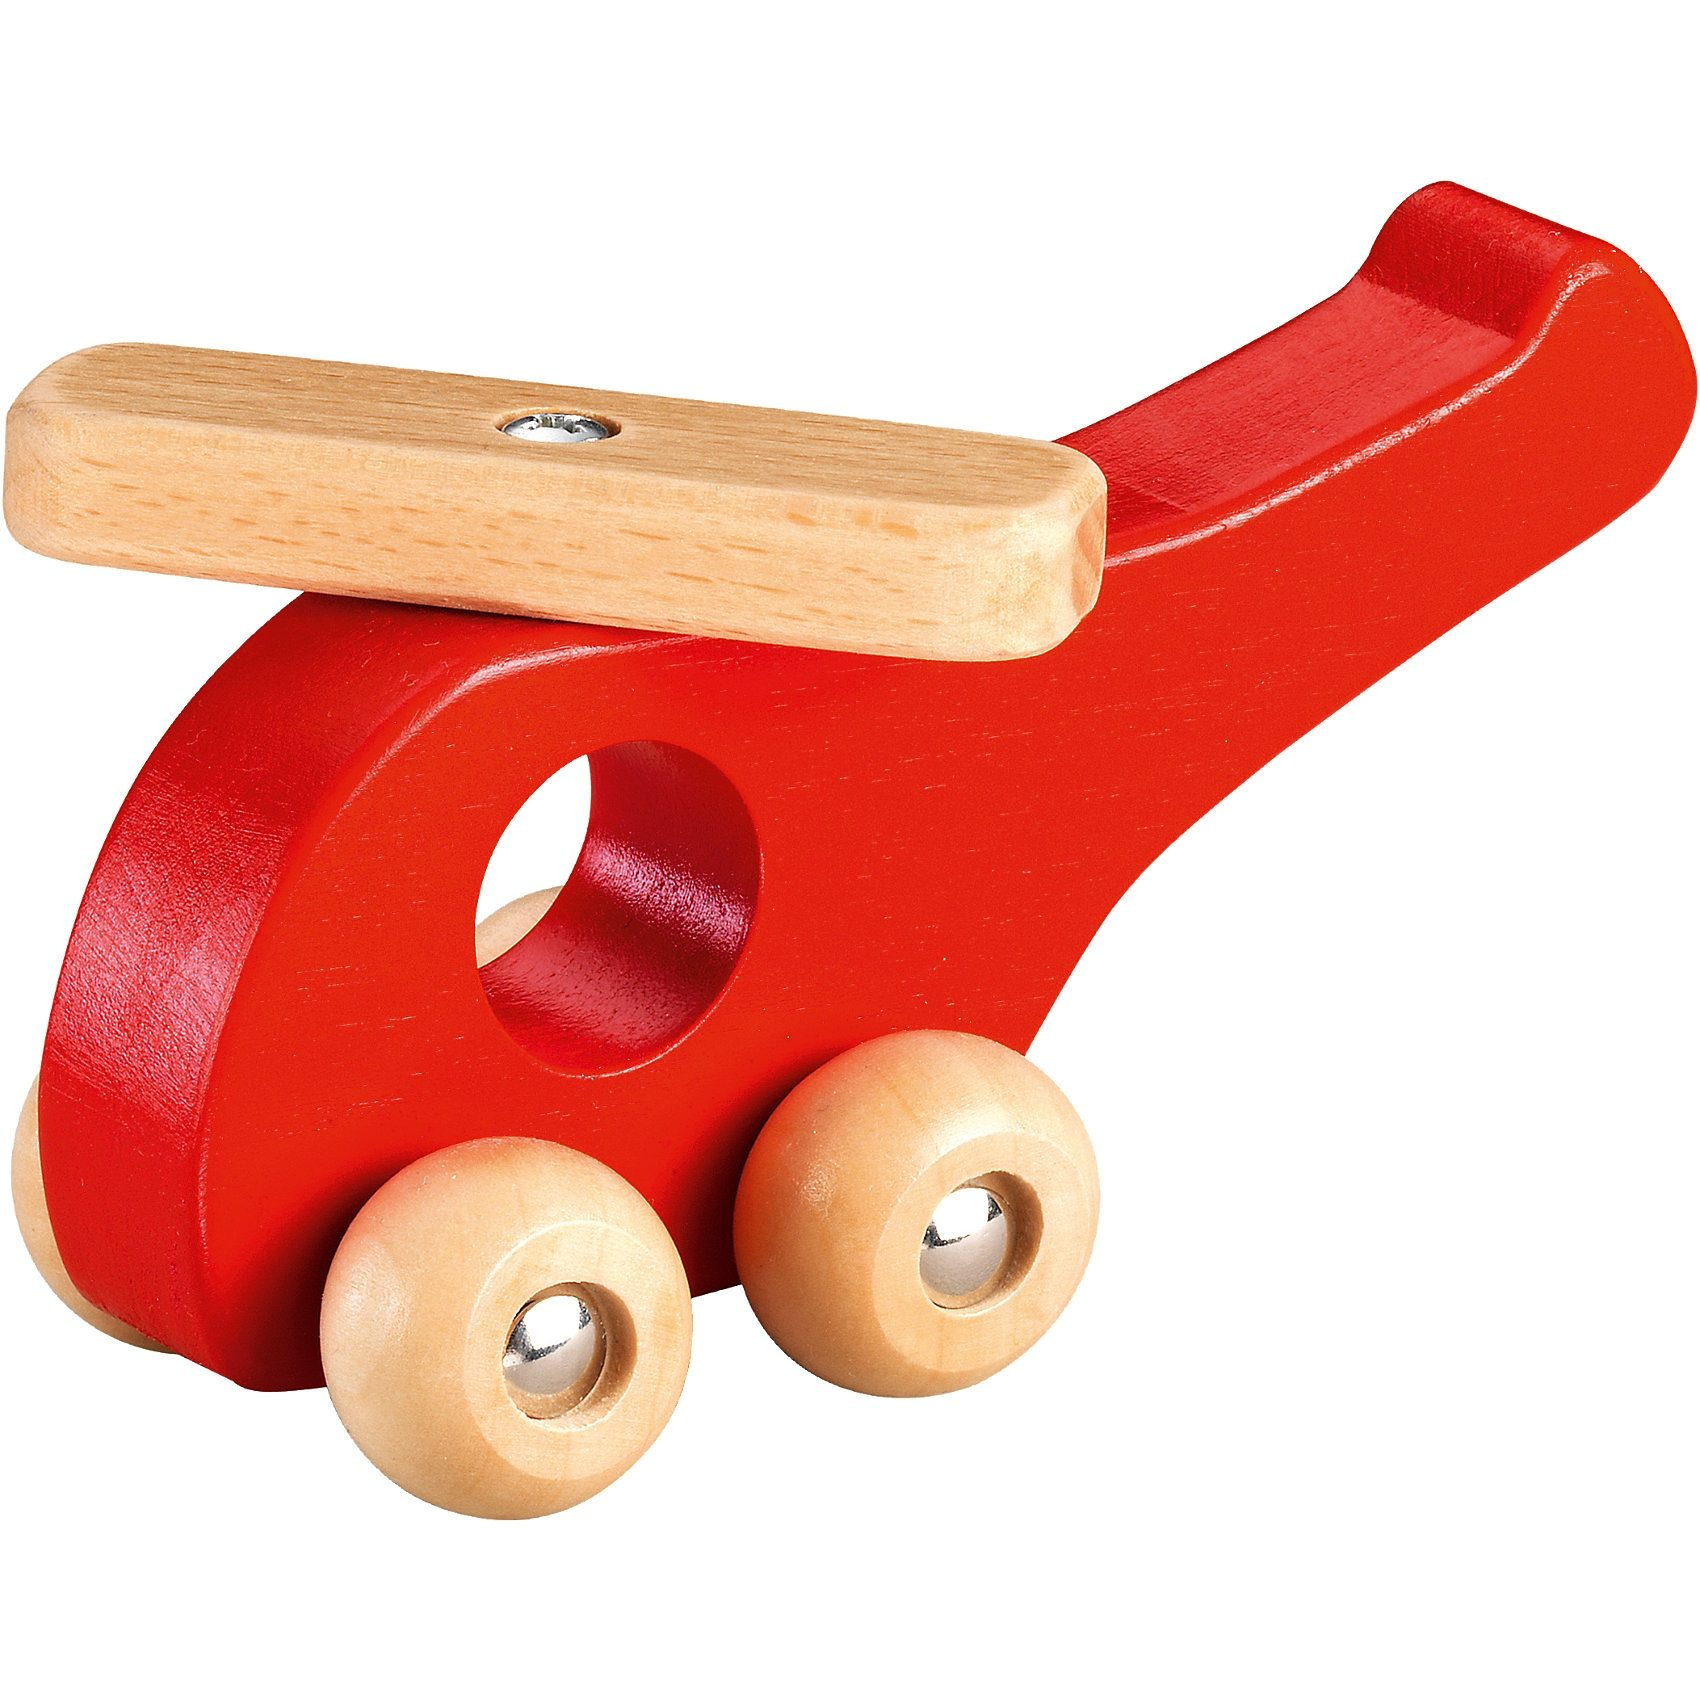 fashy Holz-Hubschrauber, rot